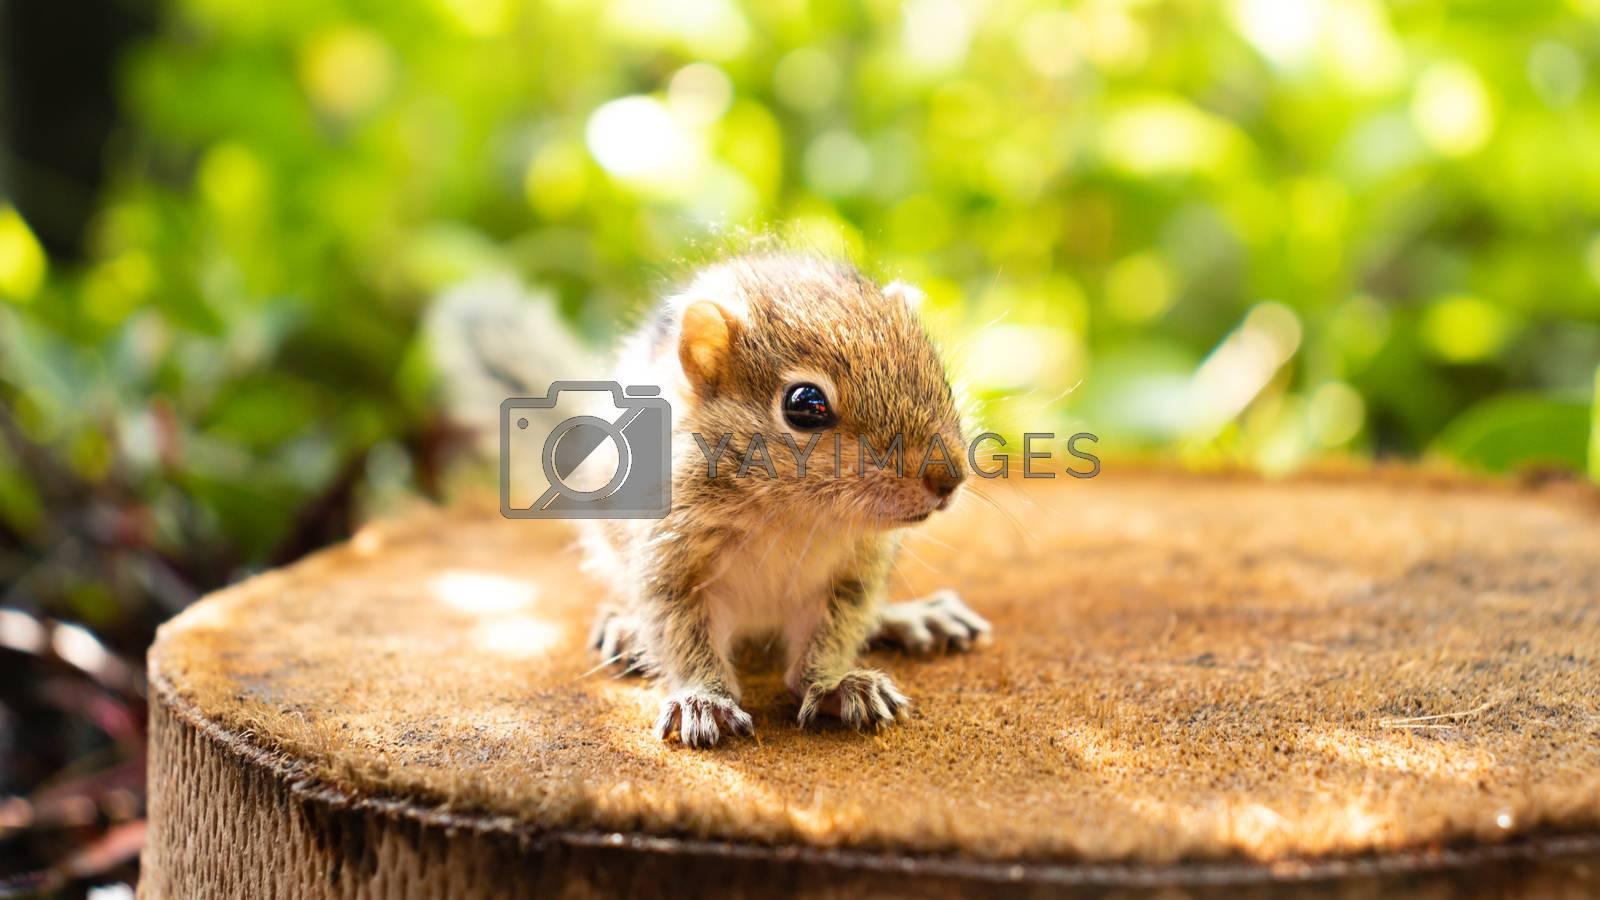 Cute abandoned Baby squirrel looking at camera